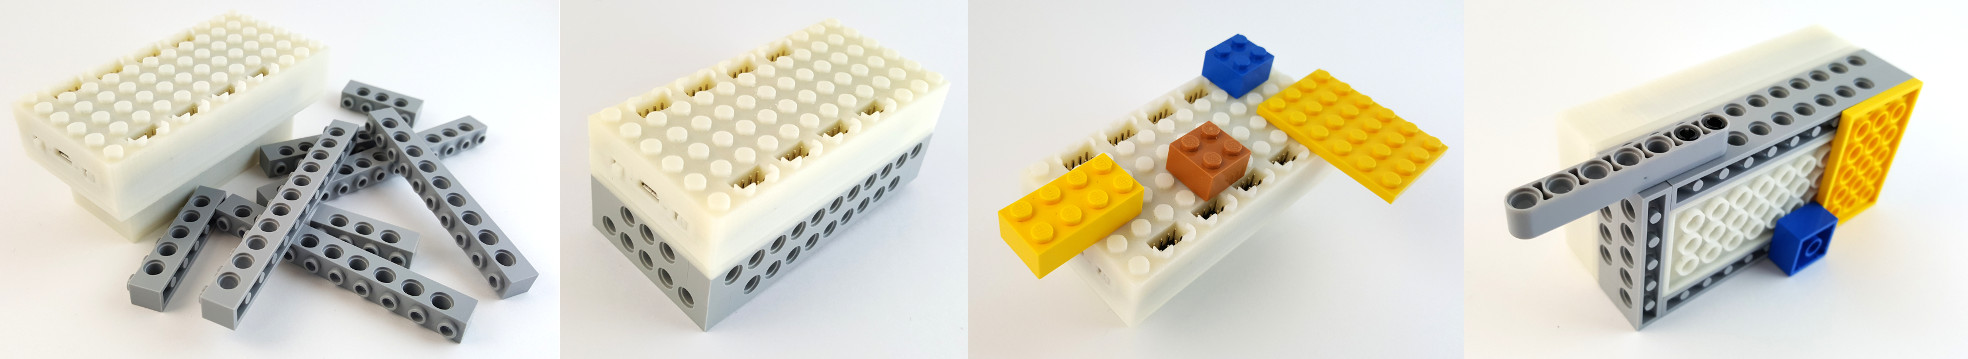 Build with LEGO bricks